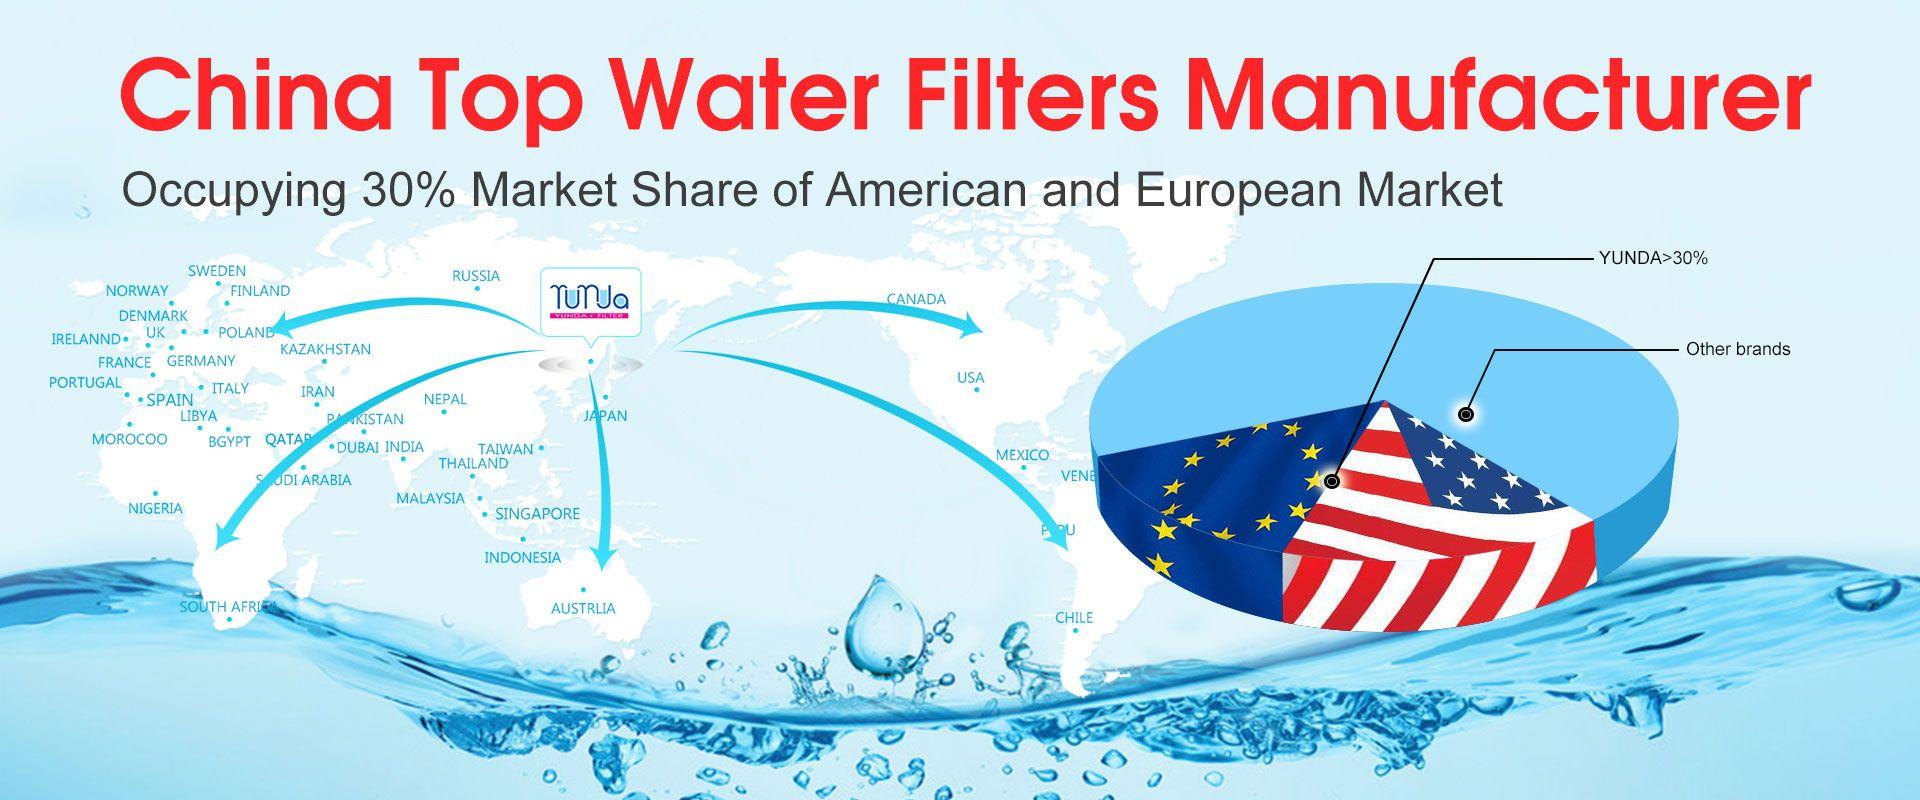 Yunda Water Filter Network Marketing Water Water Filter